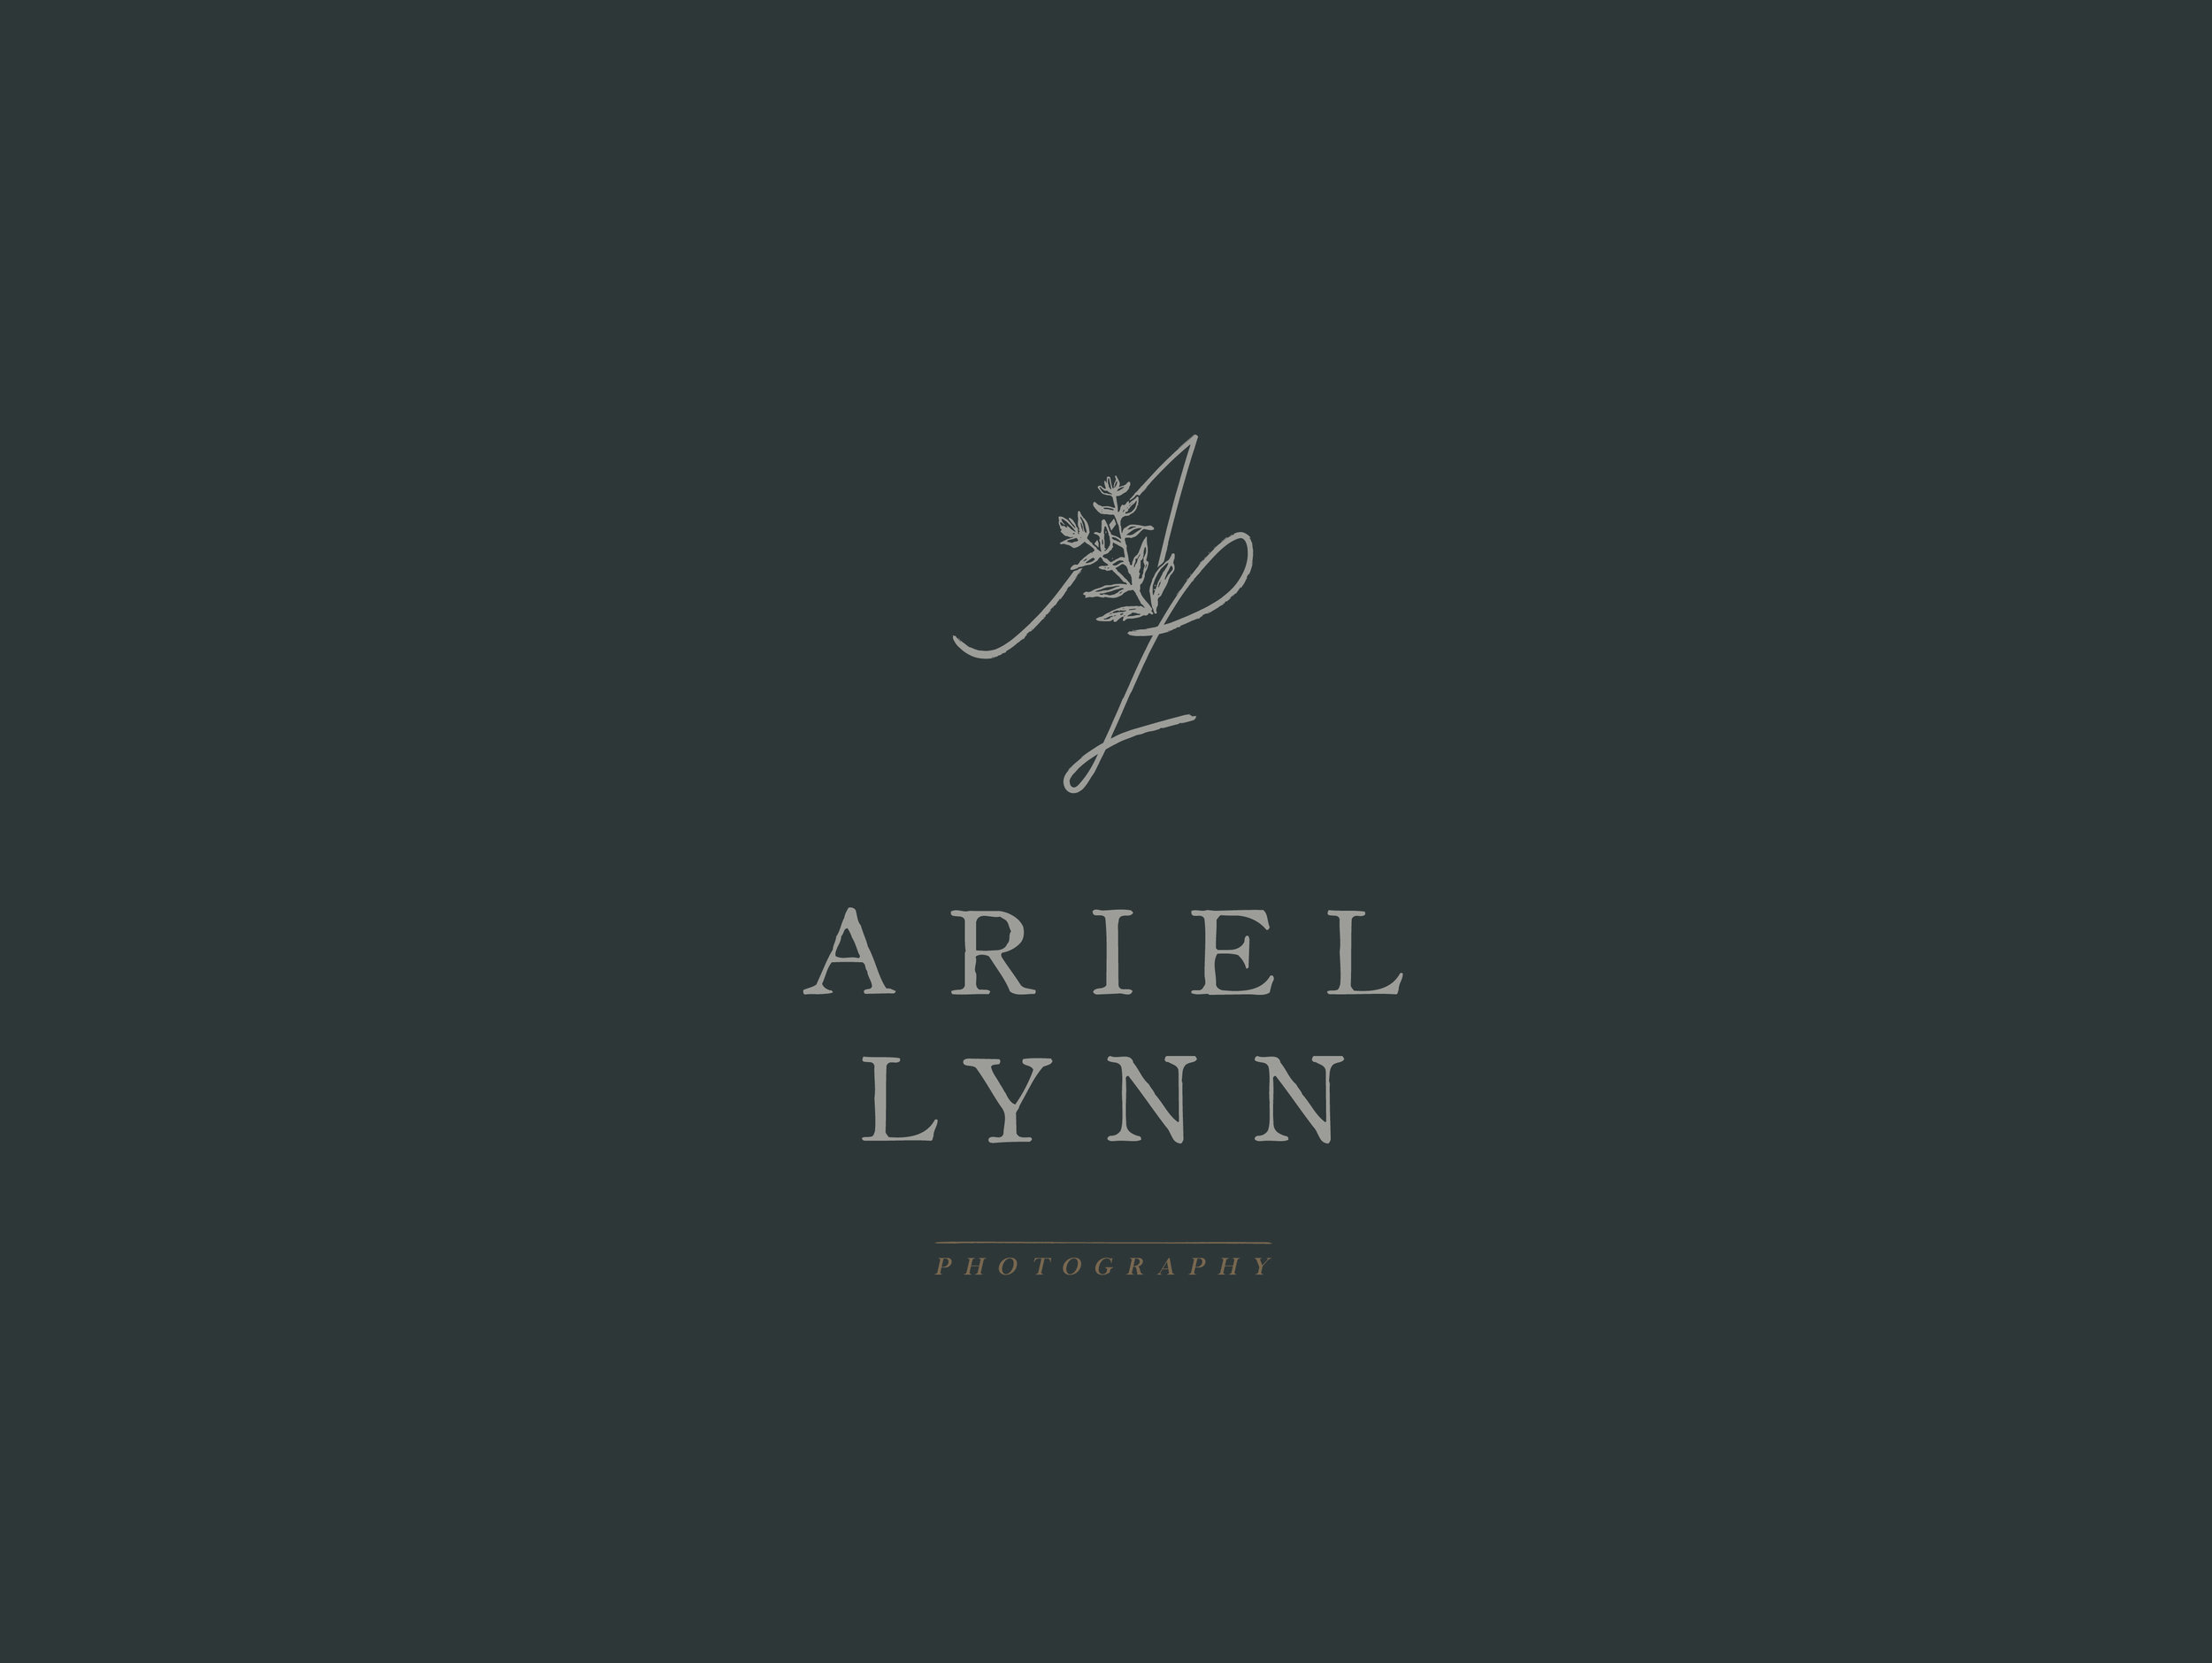 Ariel Lynn Photography - Branding Design